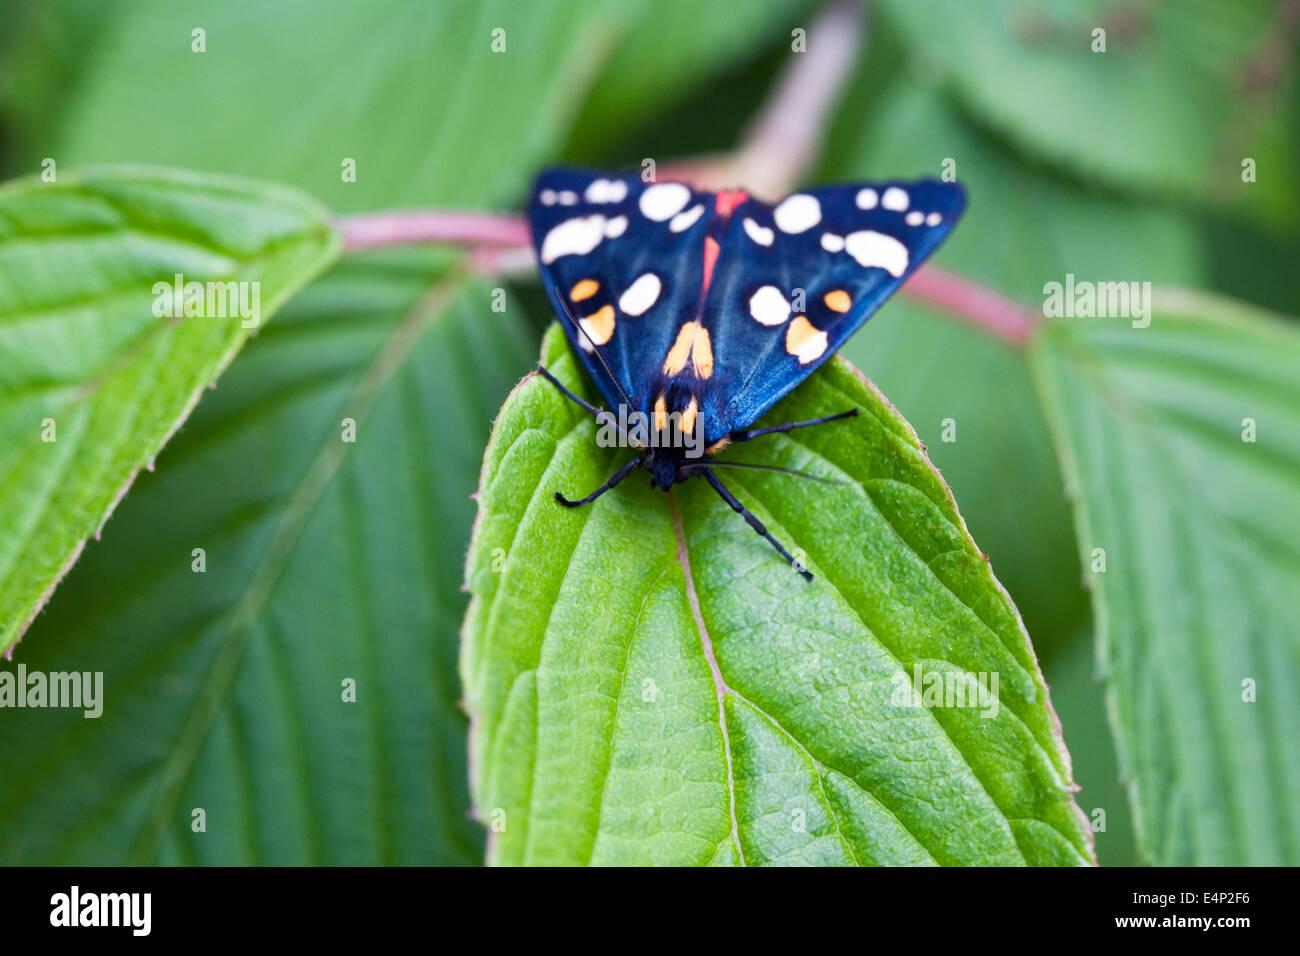 Callimorpha dominula moth on Hydrangea leaves. Scarlet Tiger moth. Stock Photo